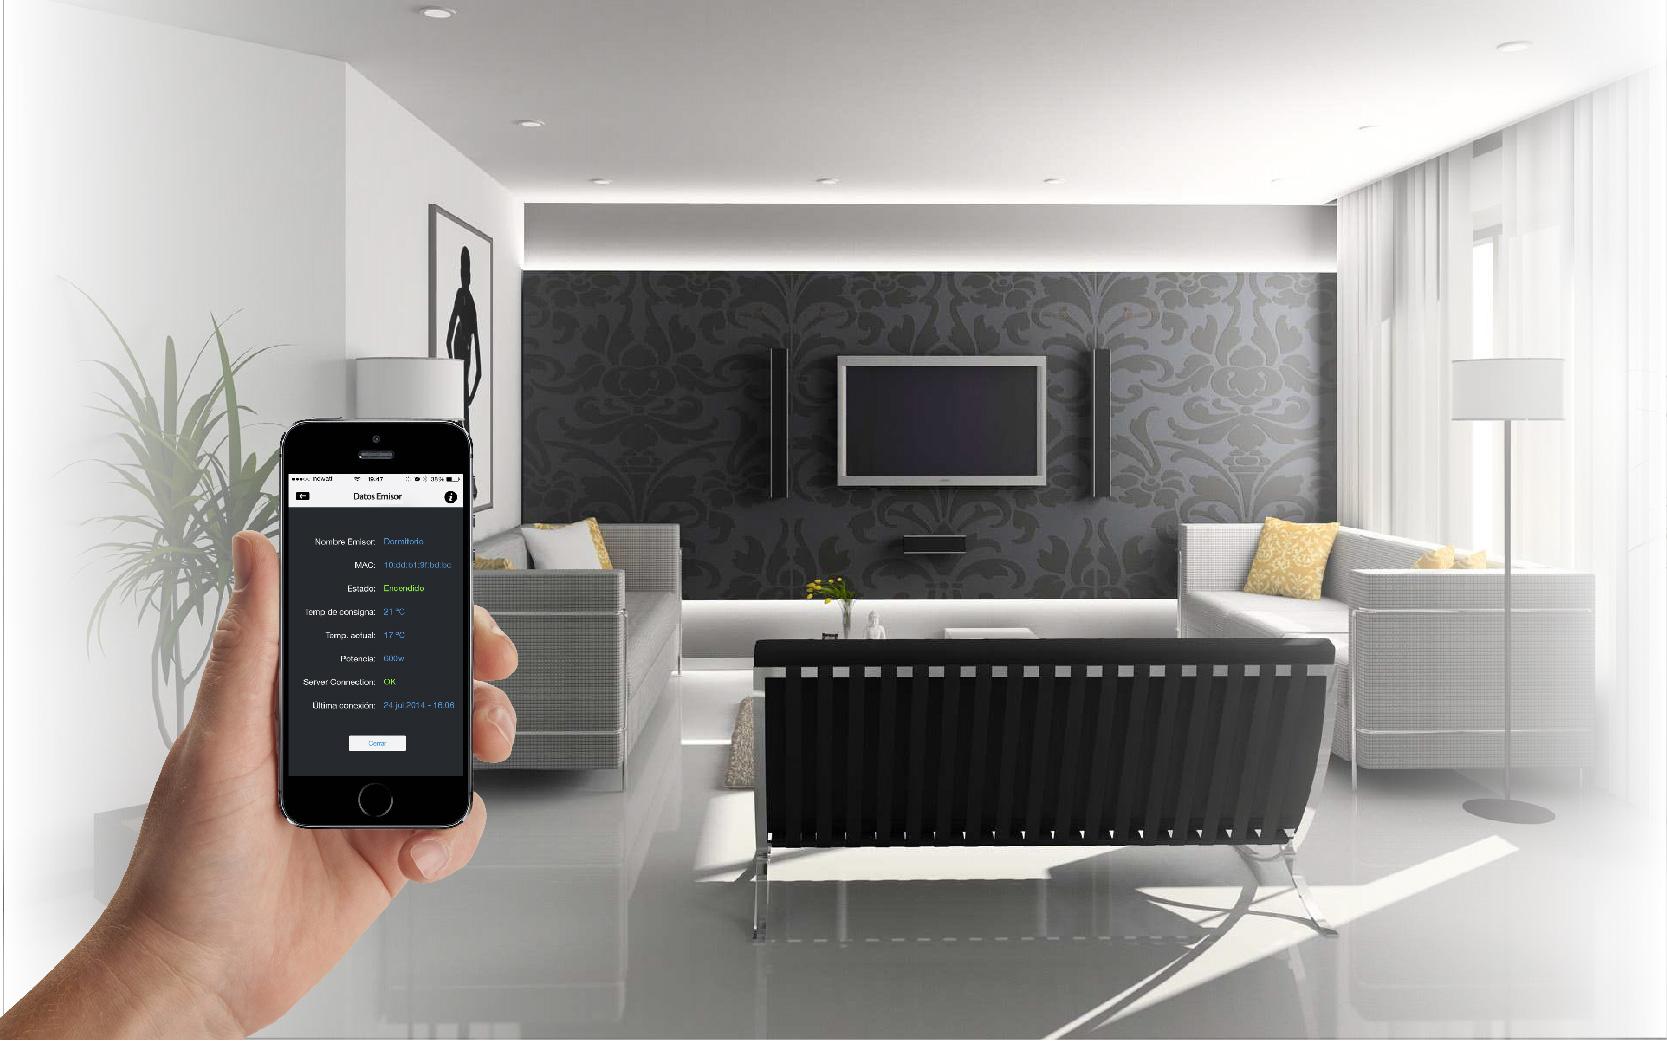 newatt-hogar-inteligente-tecnologia